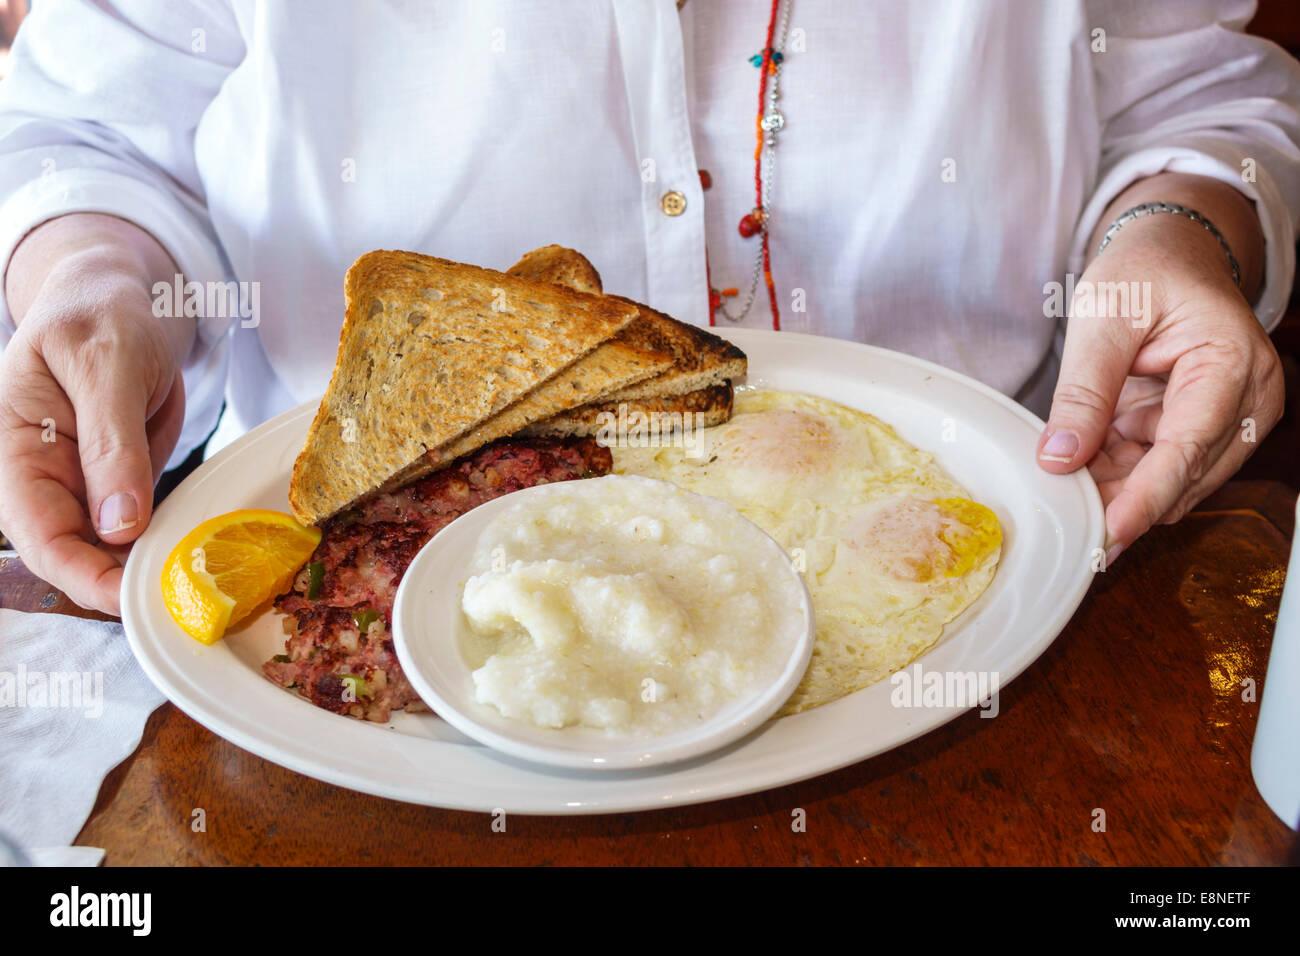 Florida Delray Beach South Ocean Boulevard Caffe Luna Rosa Restaurante plato plato desayuno huevos grits hash brown Imagen De Stock